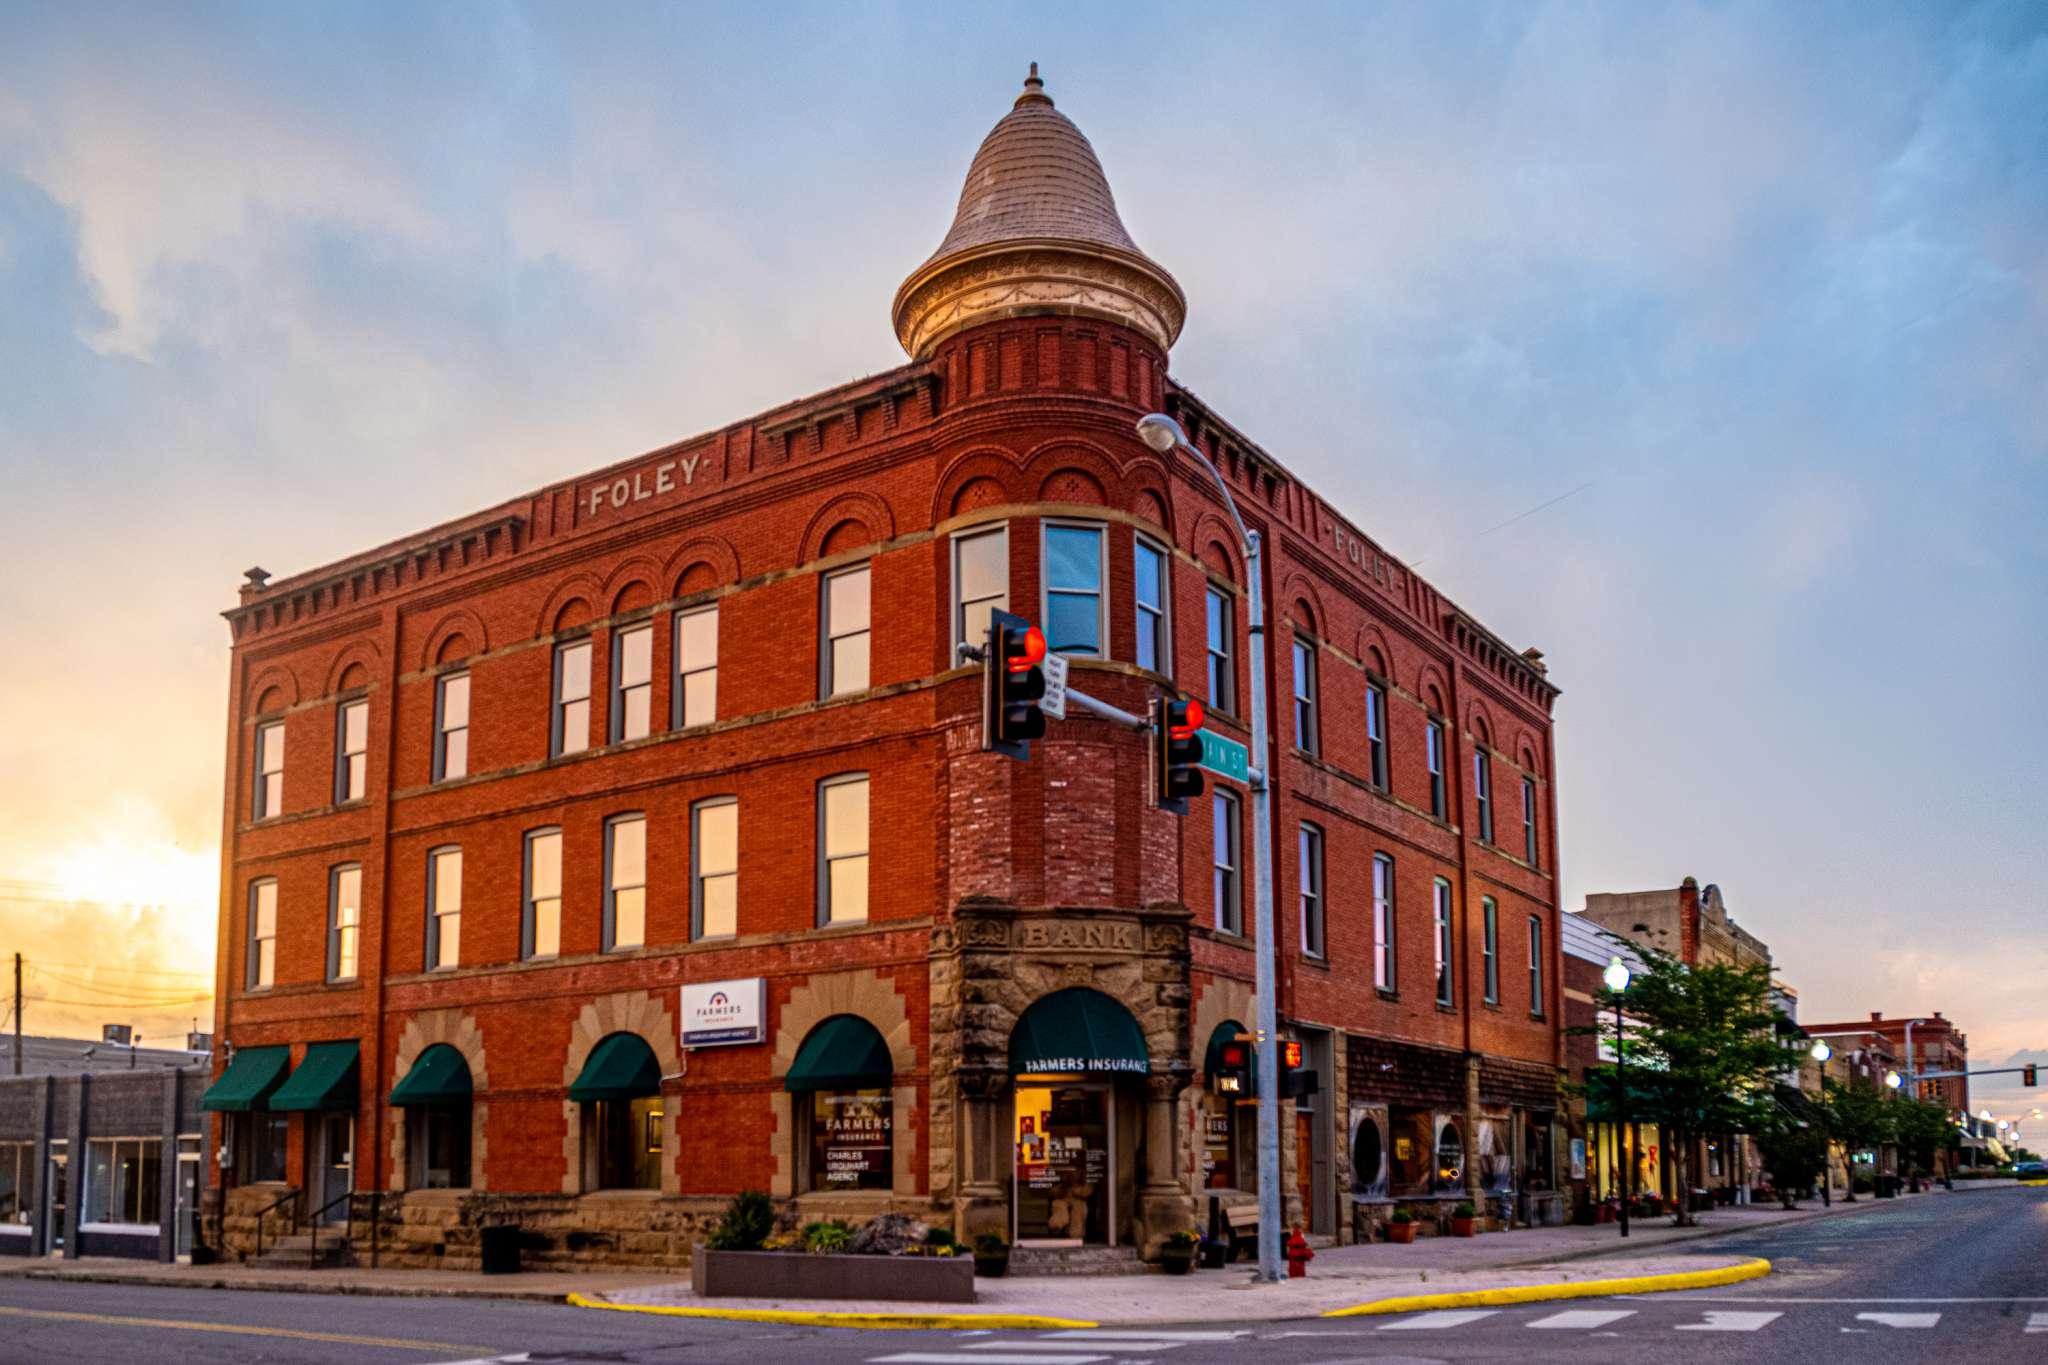 Foley Building in historic downtown Eufaula, Oklahoma